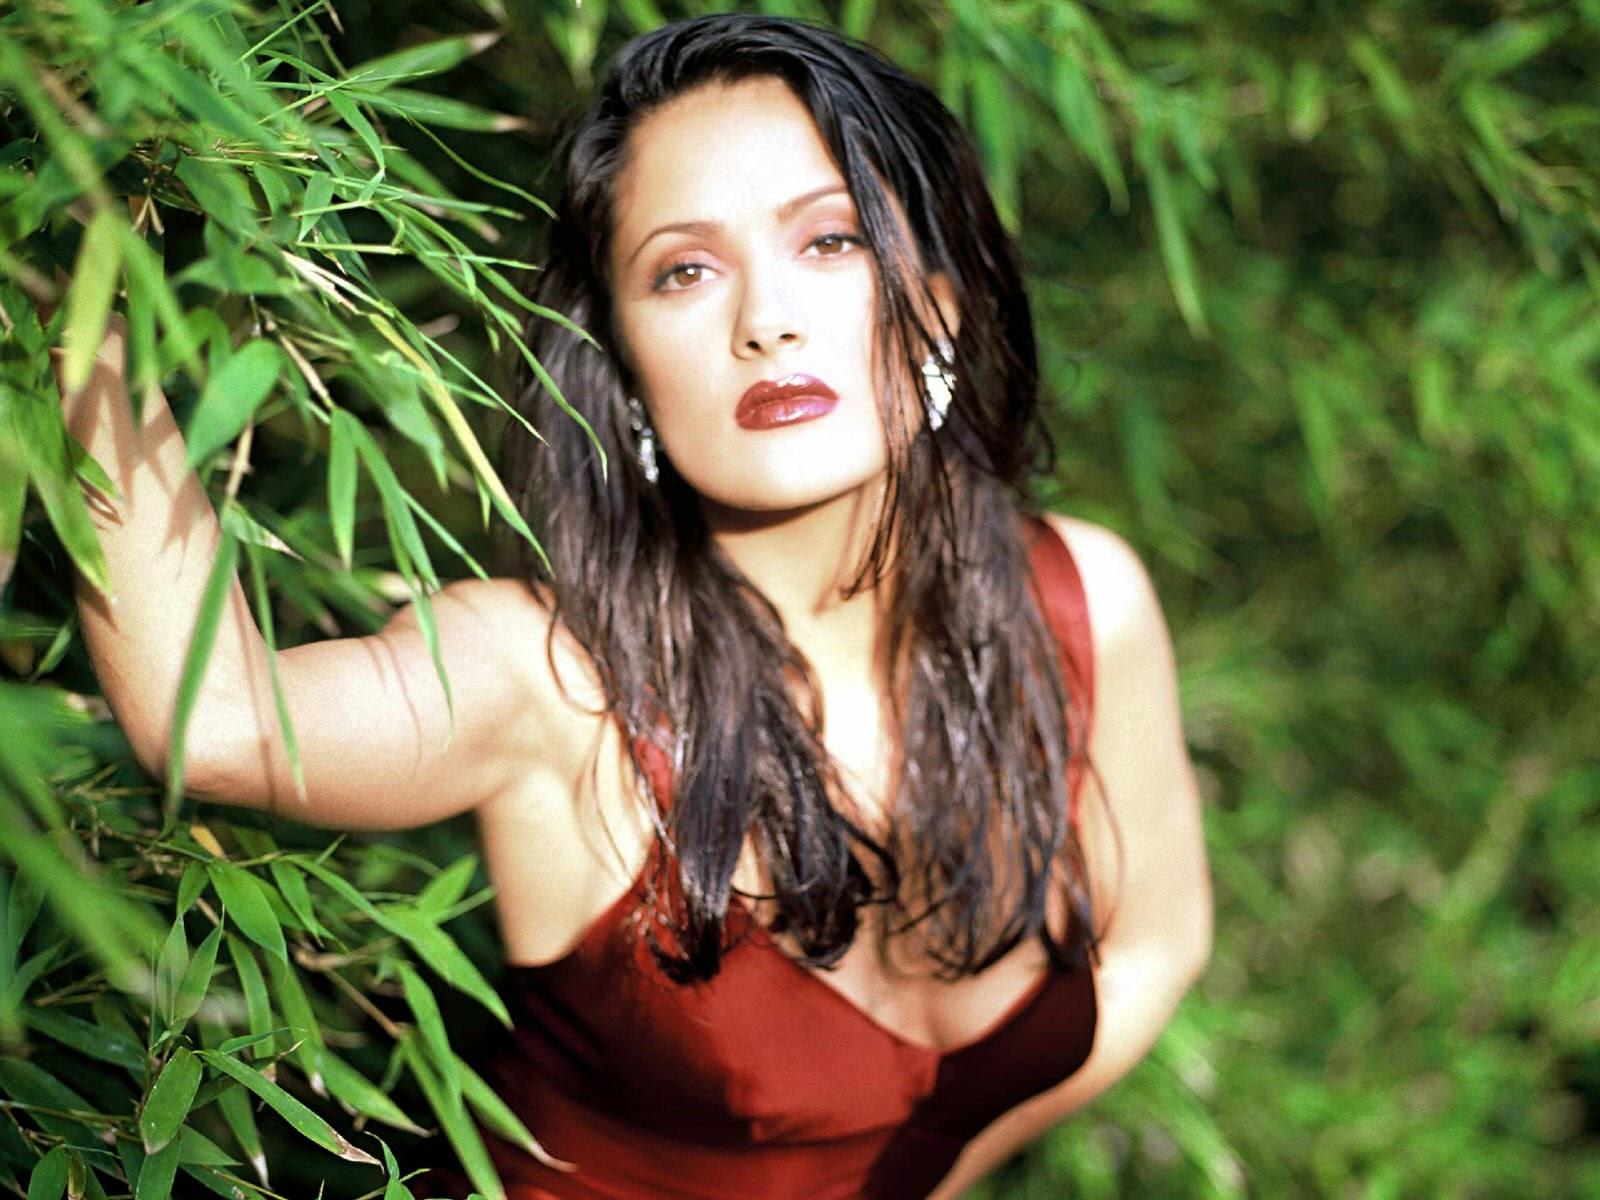 Salma Hayek in Red Dress Wallpaper